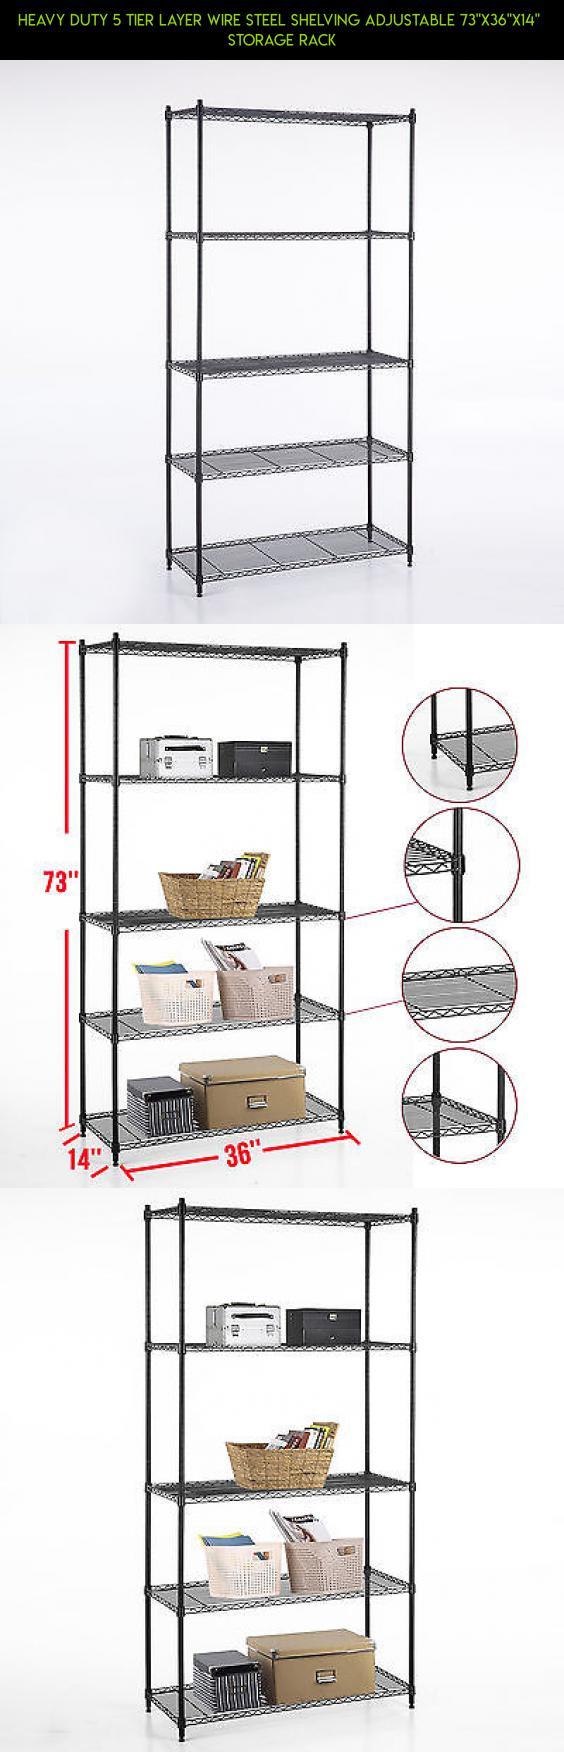 Heavy Duty 5 Tier Layer Wire Steel Shelving Adjustable 73\